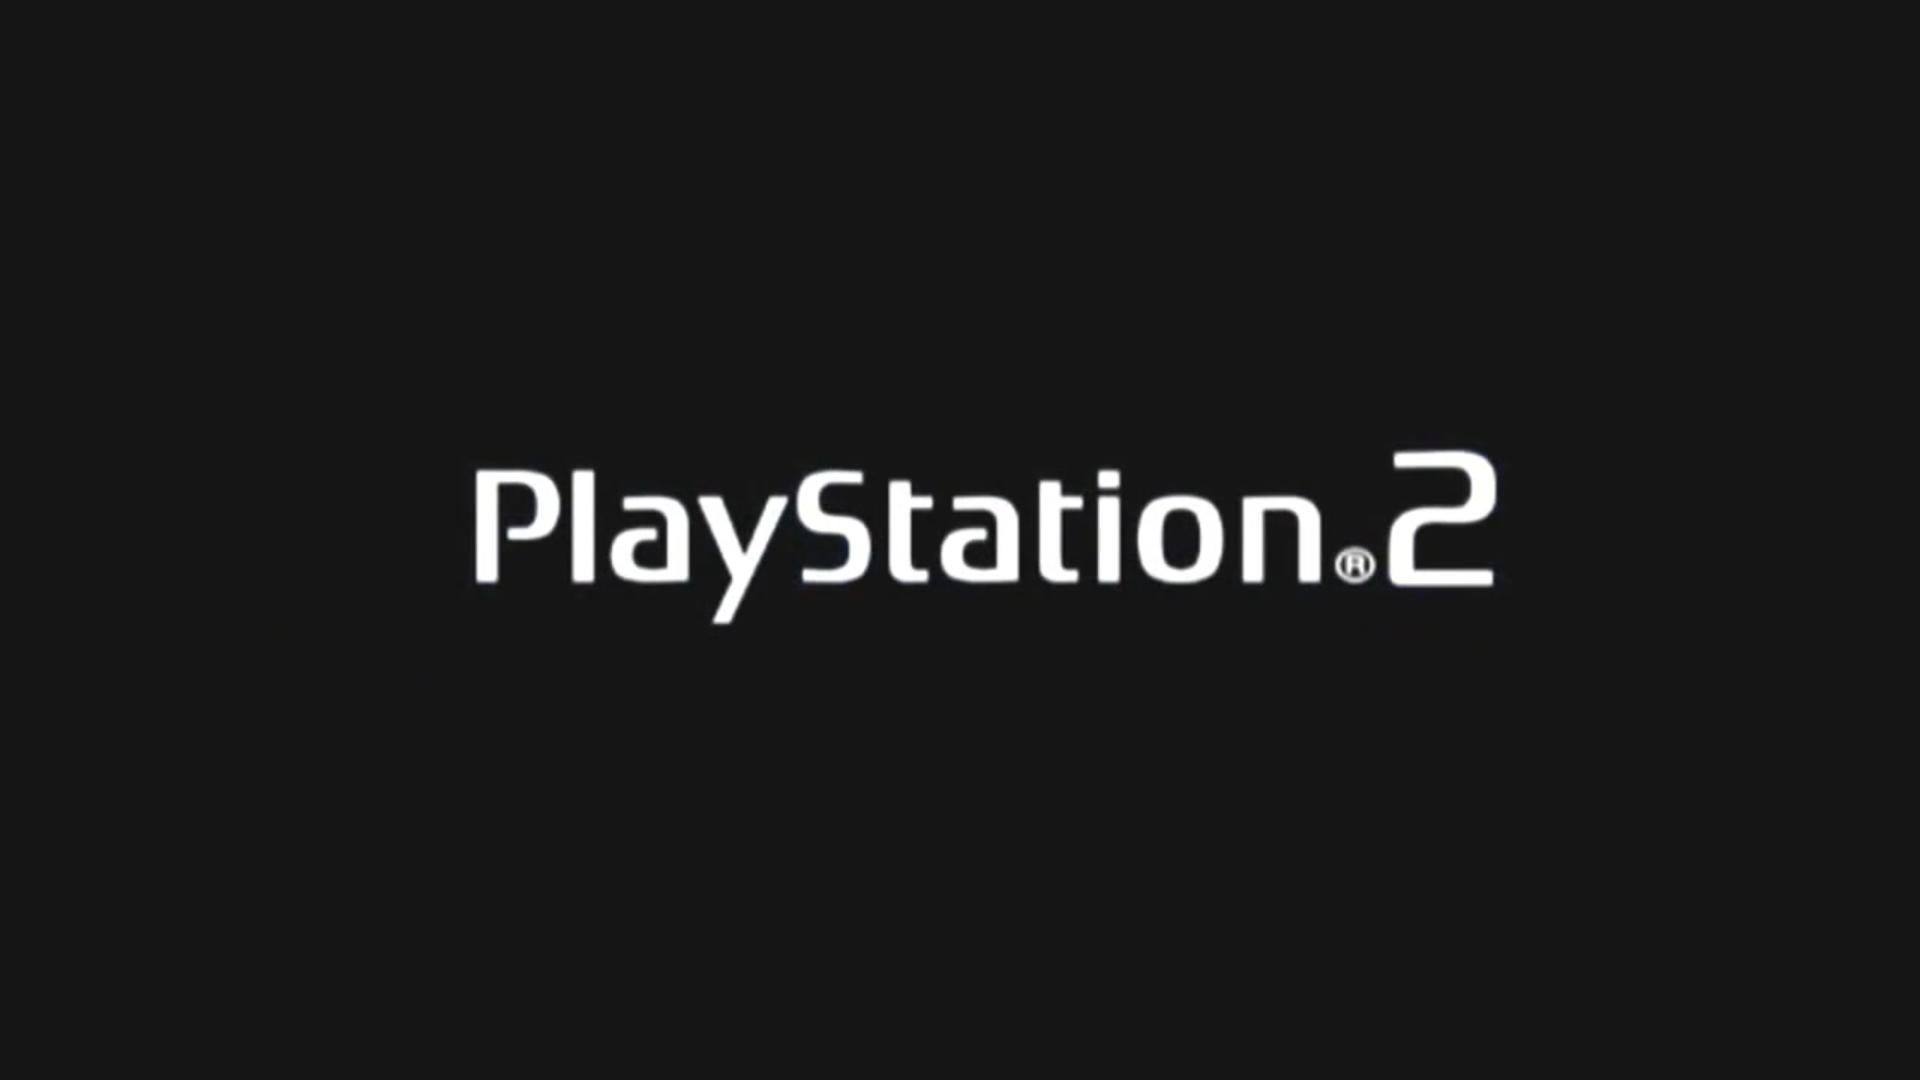 playstation 2 intro (rockstar logo replacer) - gta5-mods